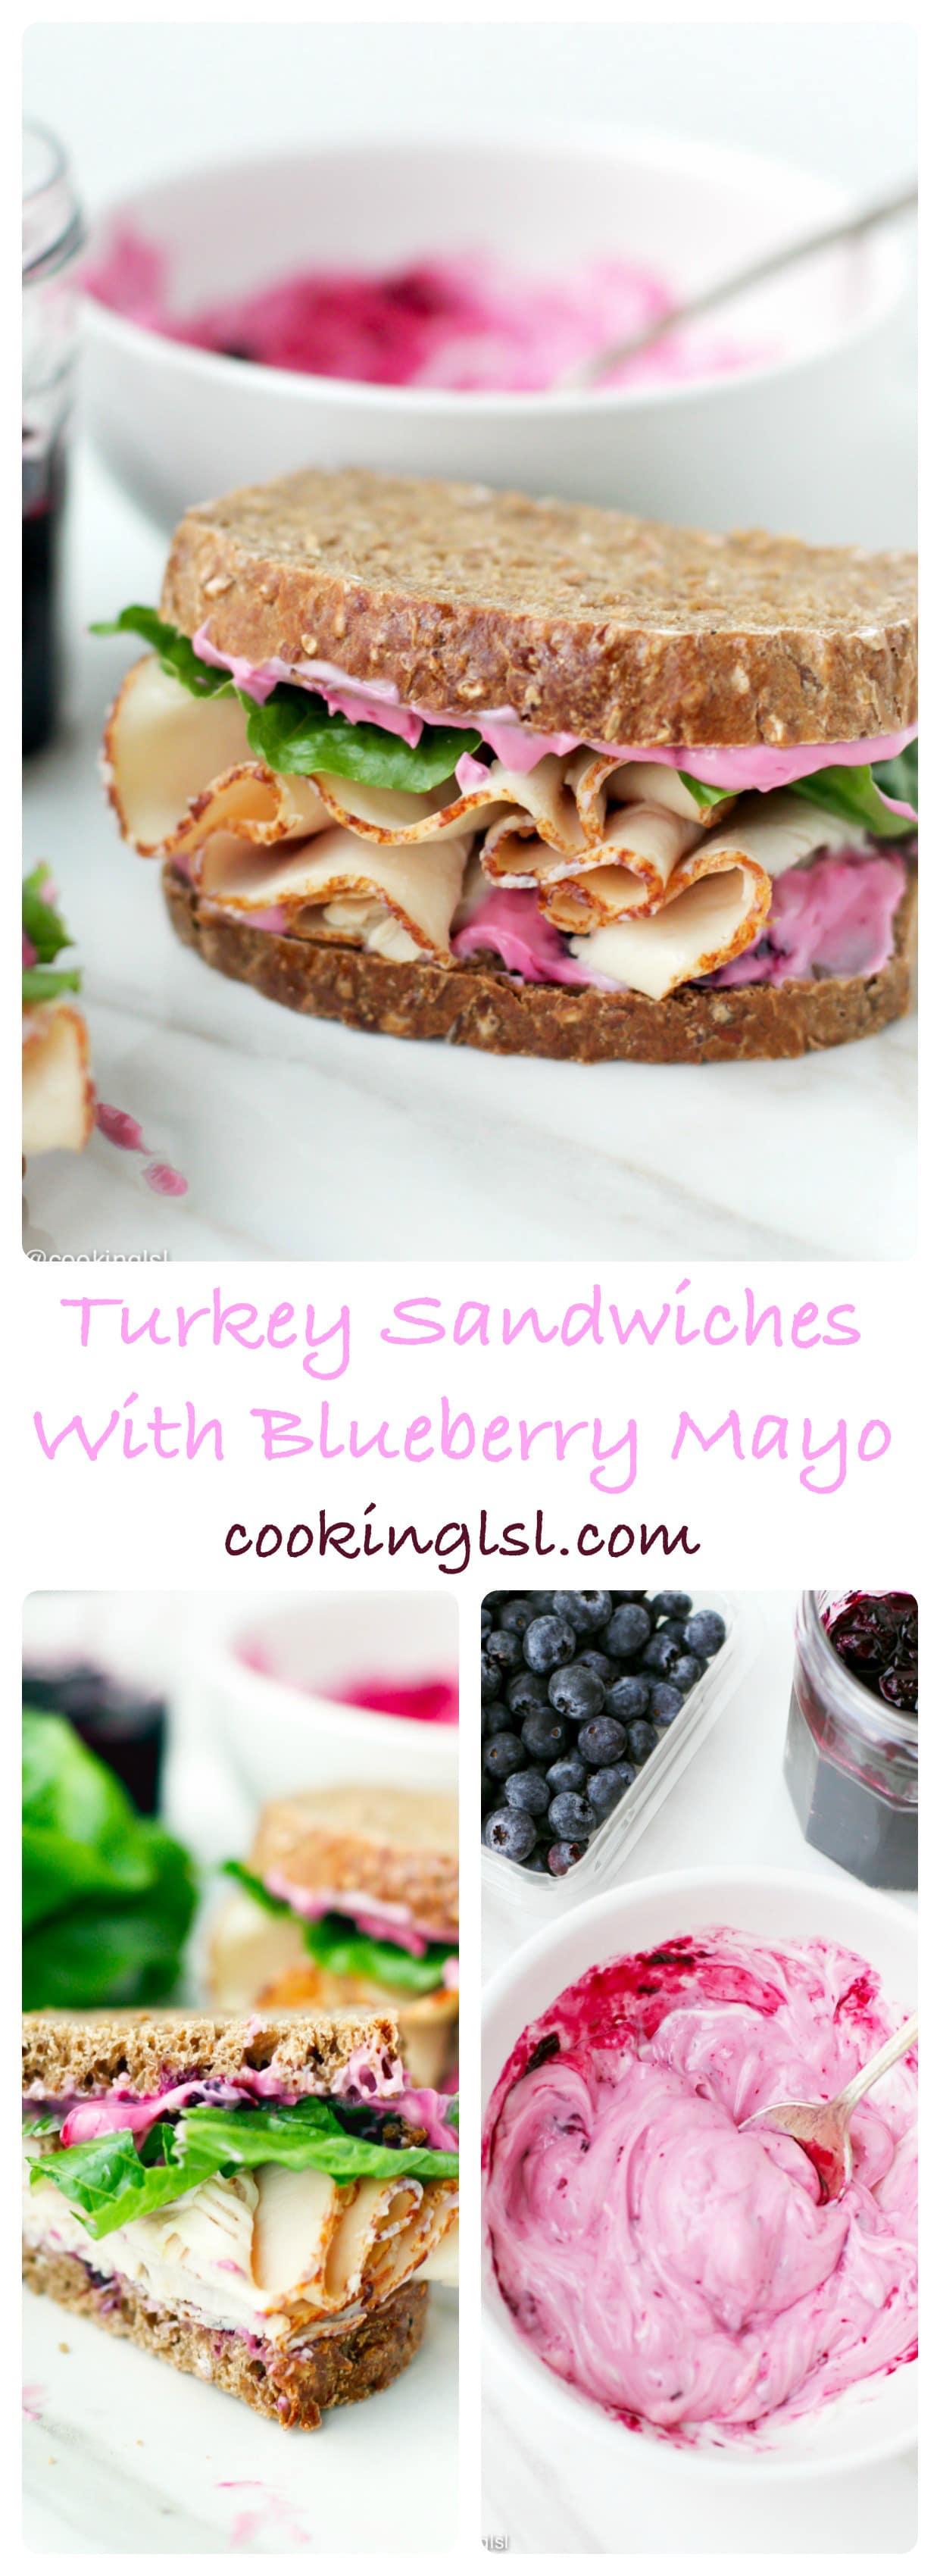 turkey-sandwiches-blueberry-mayo